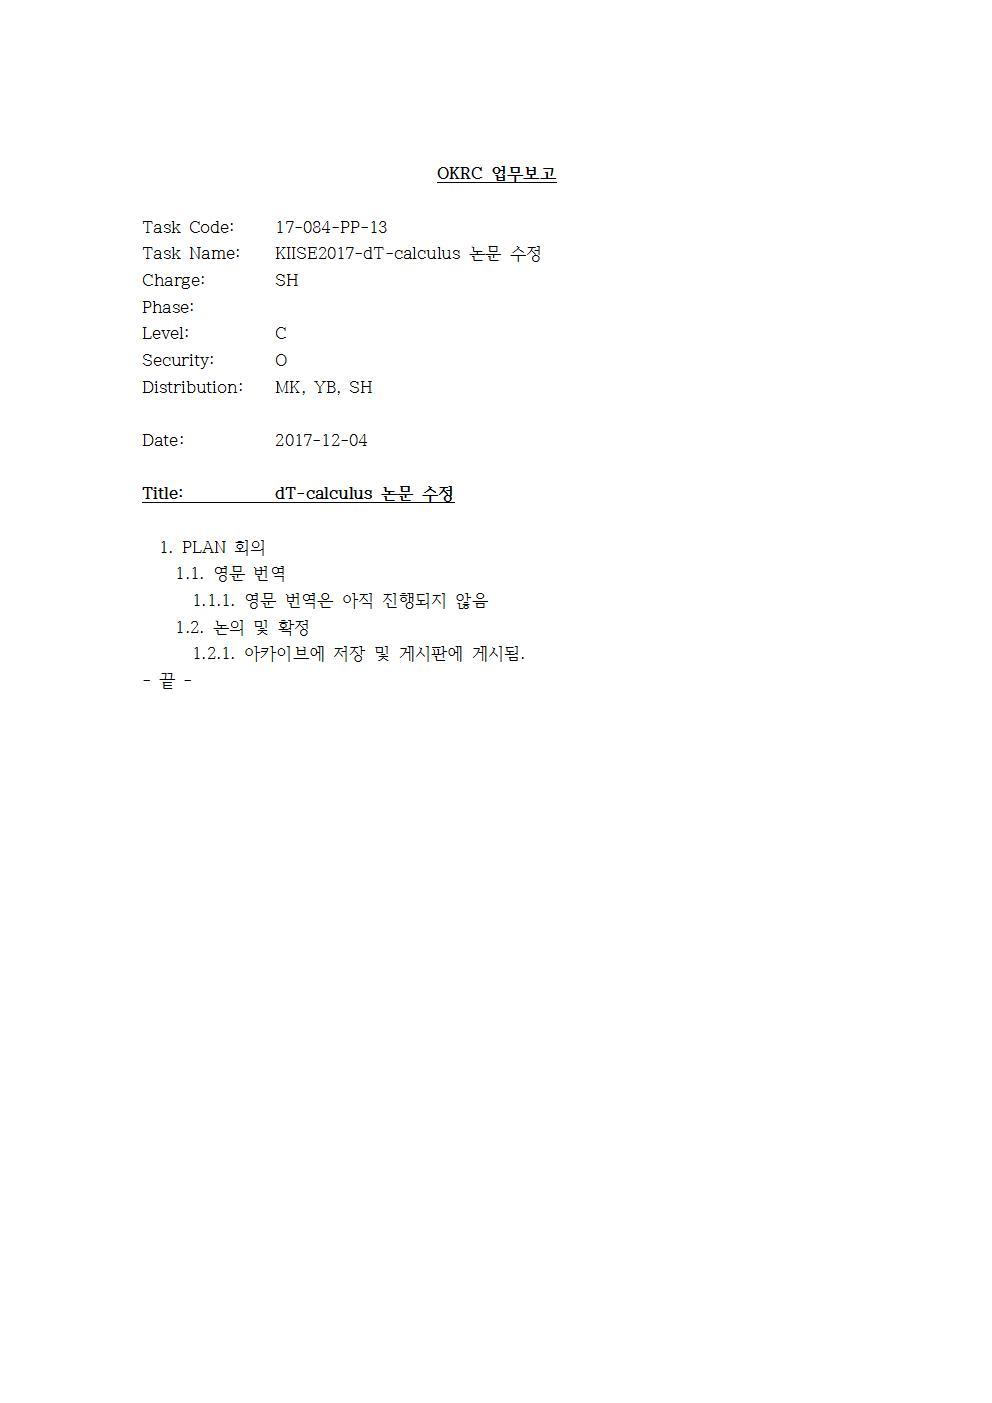 D-[17-084-PP-13]-[KIISE2017-dT-calculus]-[SH]-[2017-12-04]001.jpg